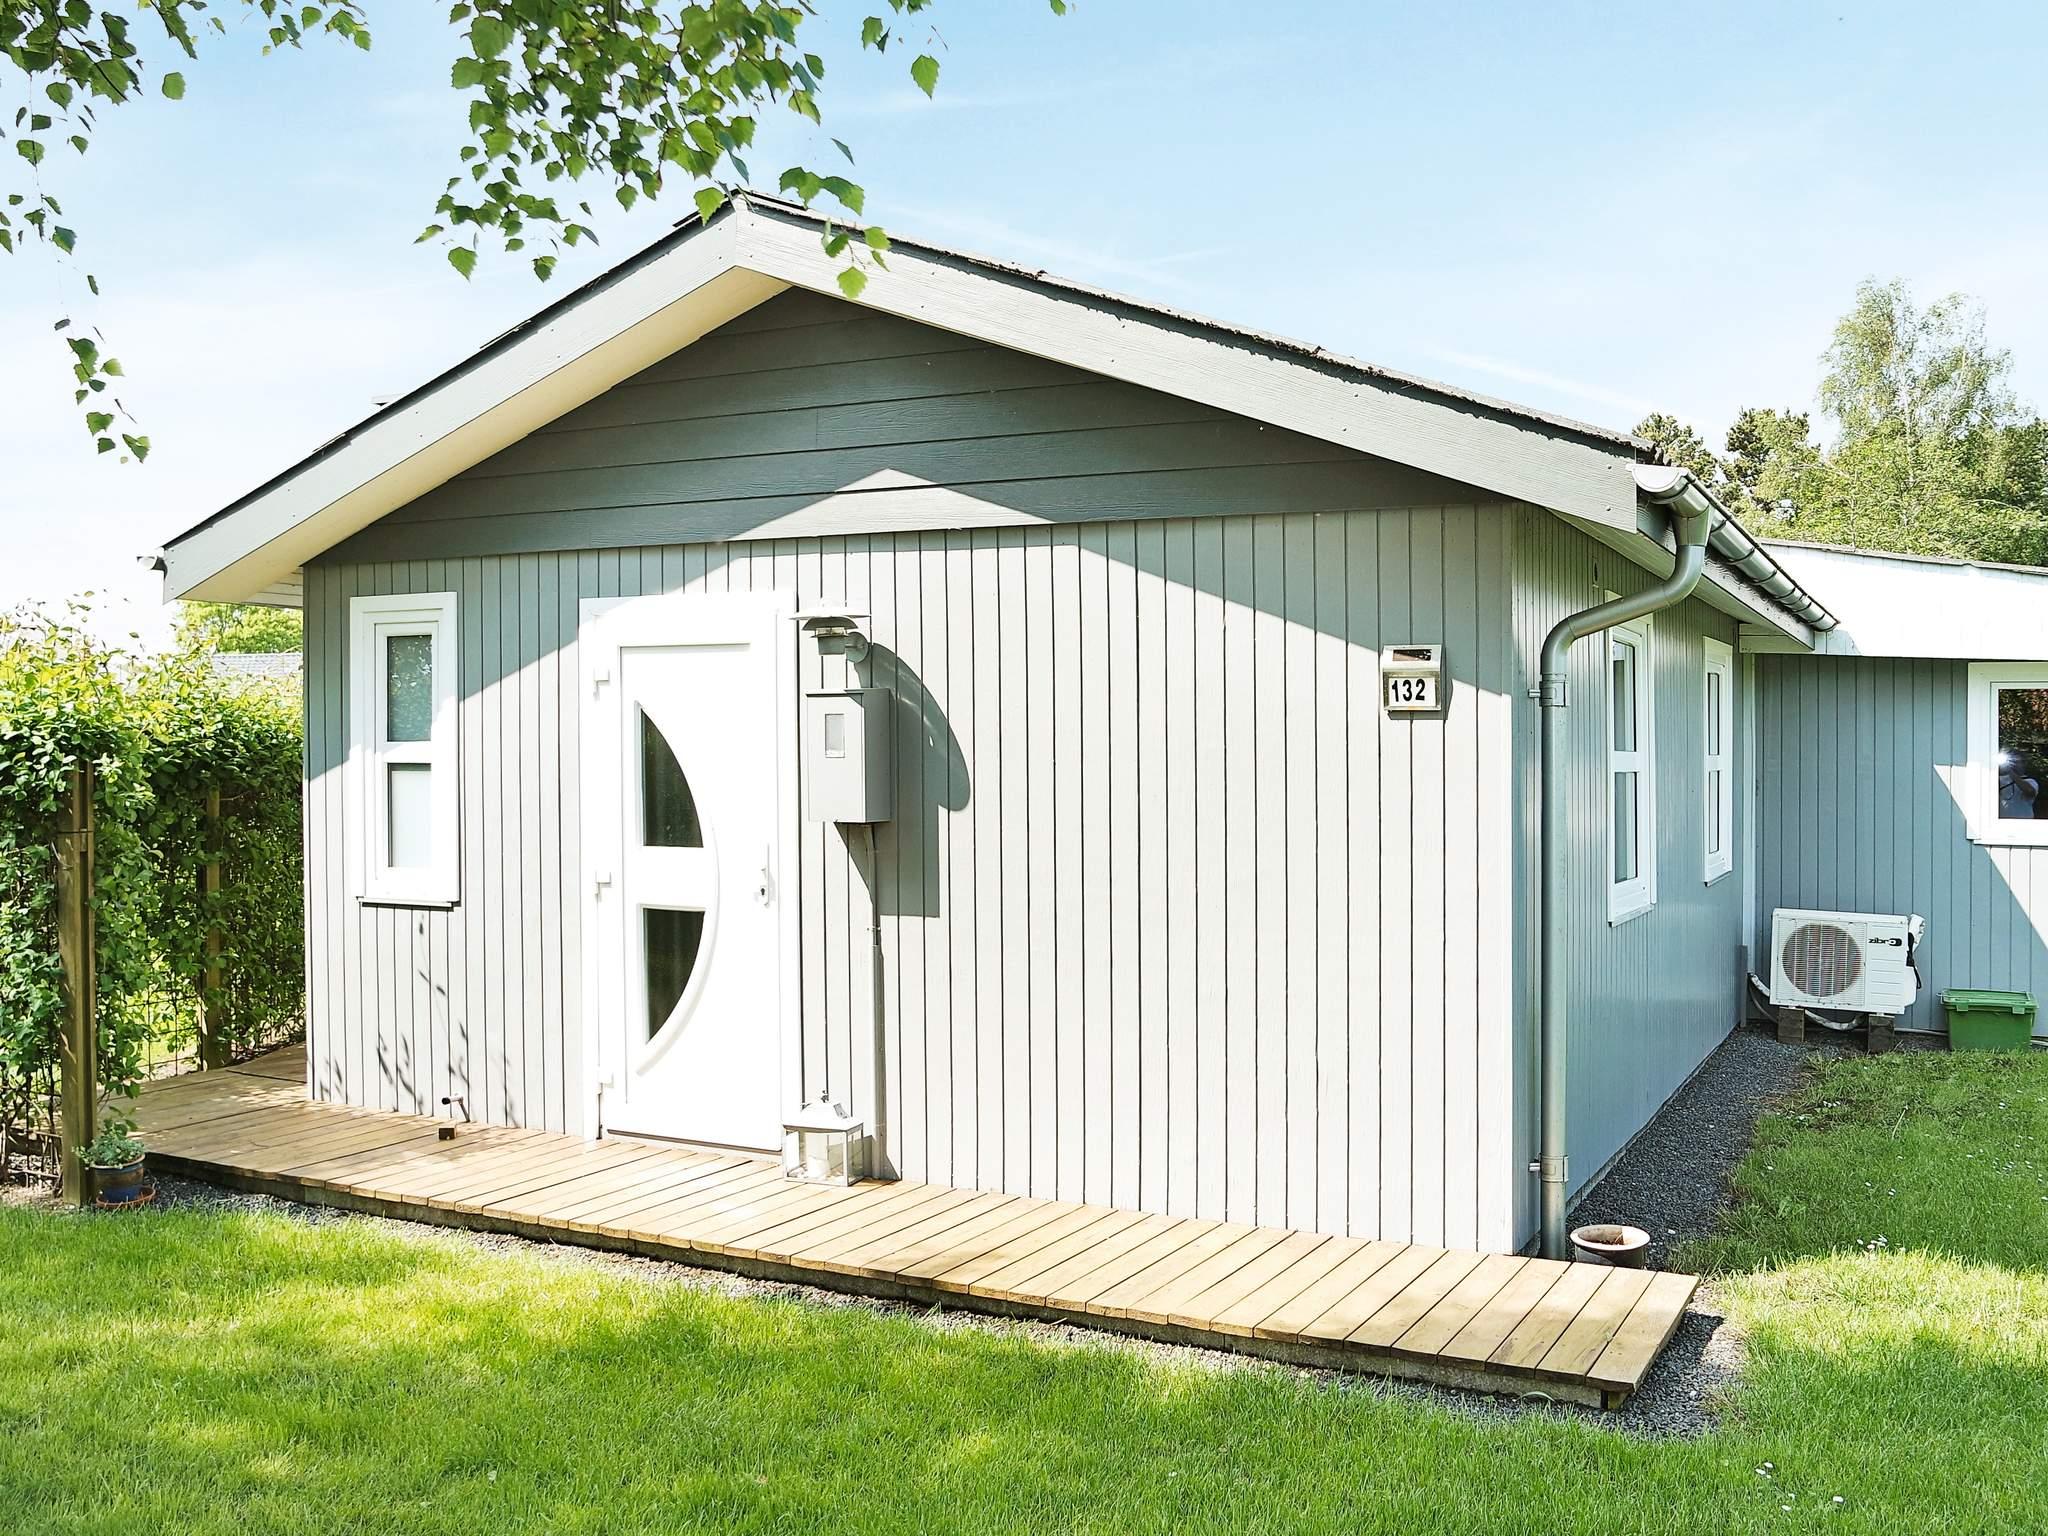 Ferienhaus Øster Hurup (85519), Øster Hurup, , Ostjütland, Dänemark, Bild 12